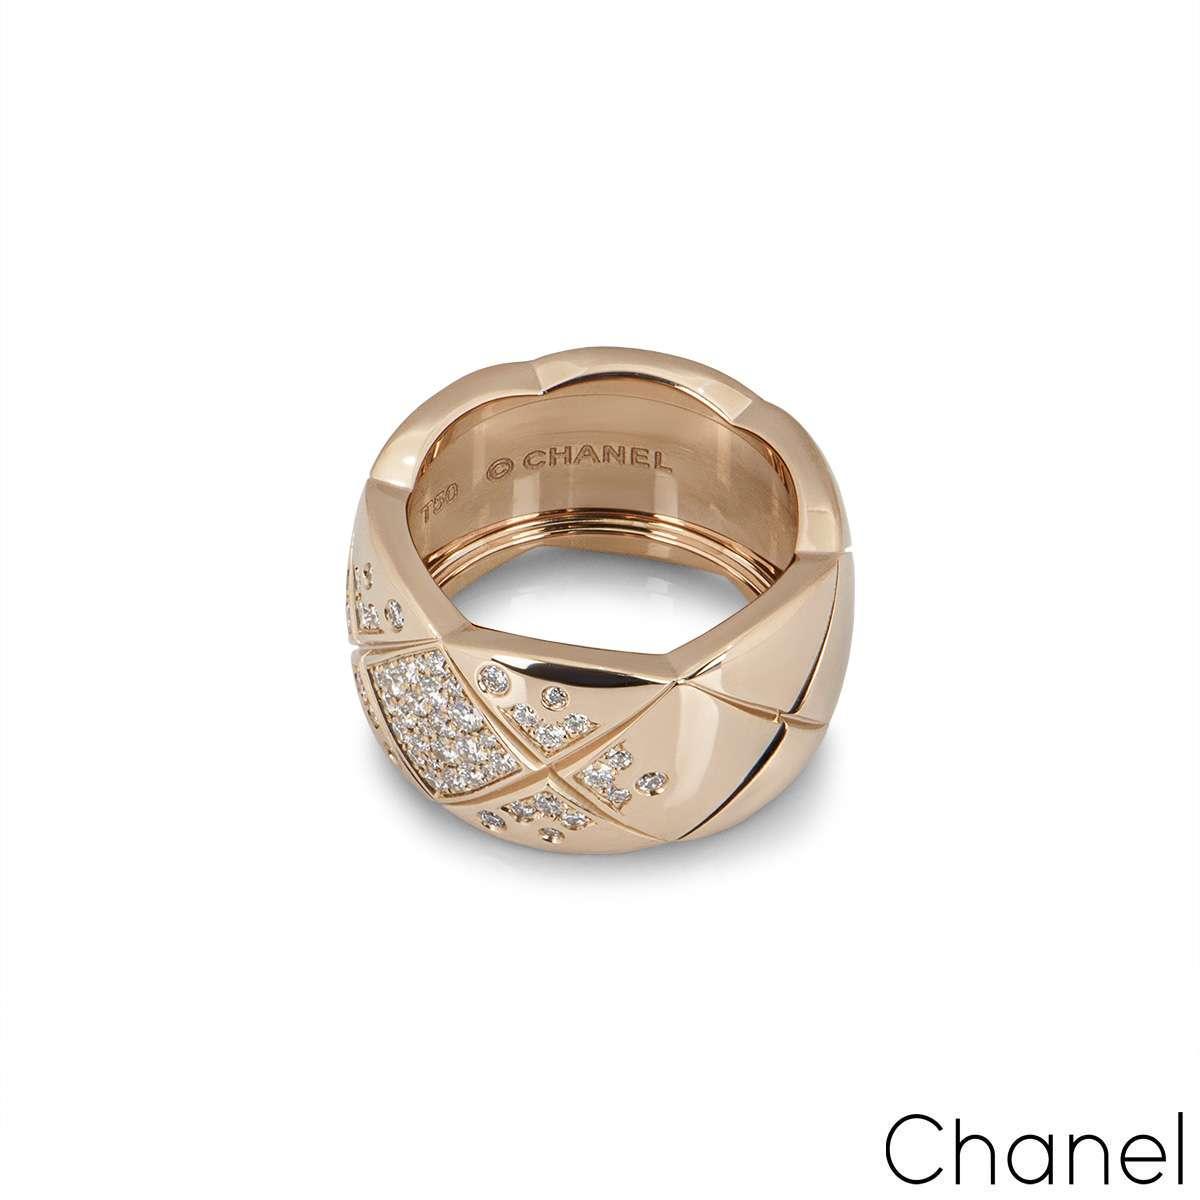 Chanel Beige / Rose Gold Diamond Coco Crush Ring J11100